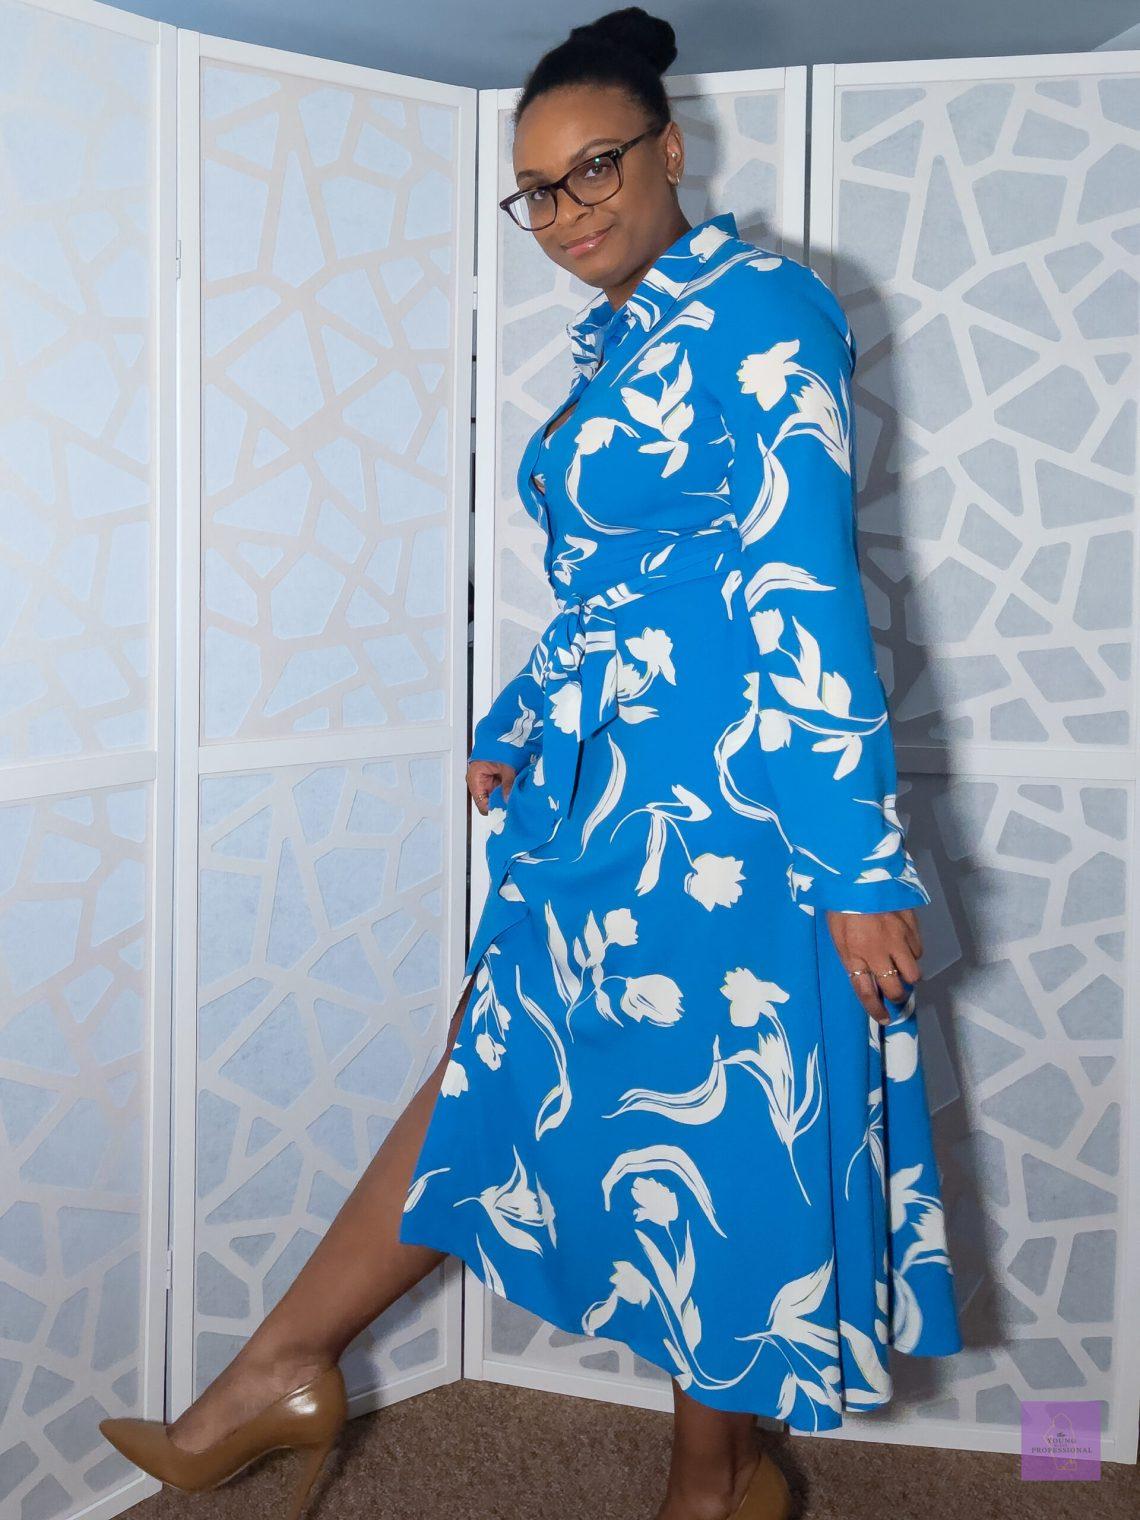 Colorful professional dress 1